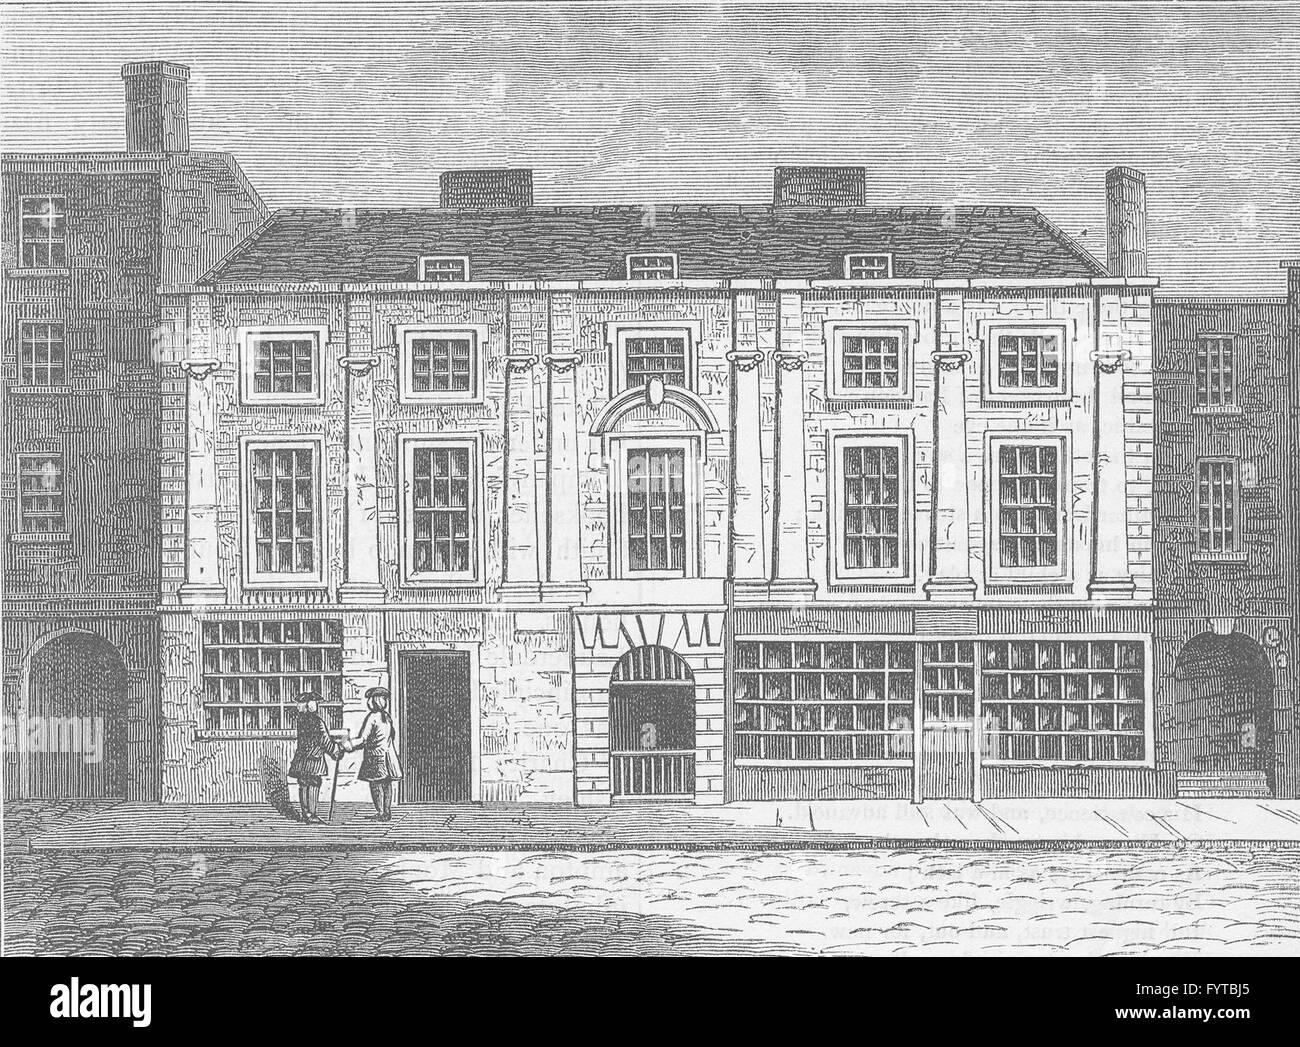 ALDERSGATE STREET: Shaftesbury House in 1810. London, antique print c1880 - Stock Image